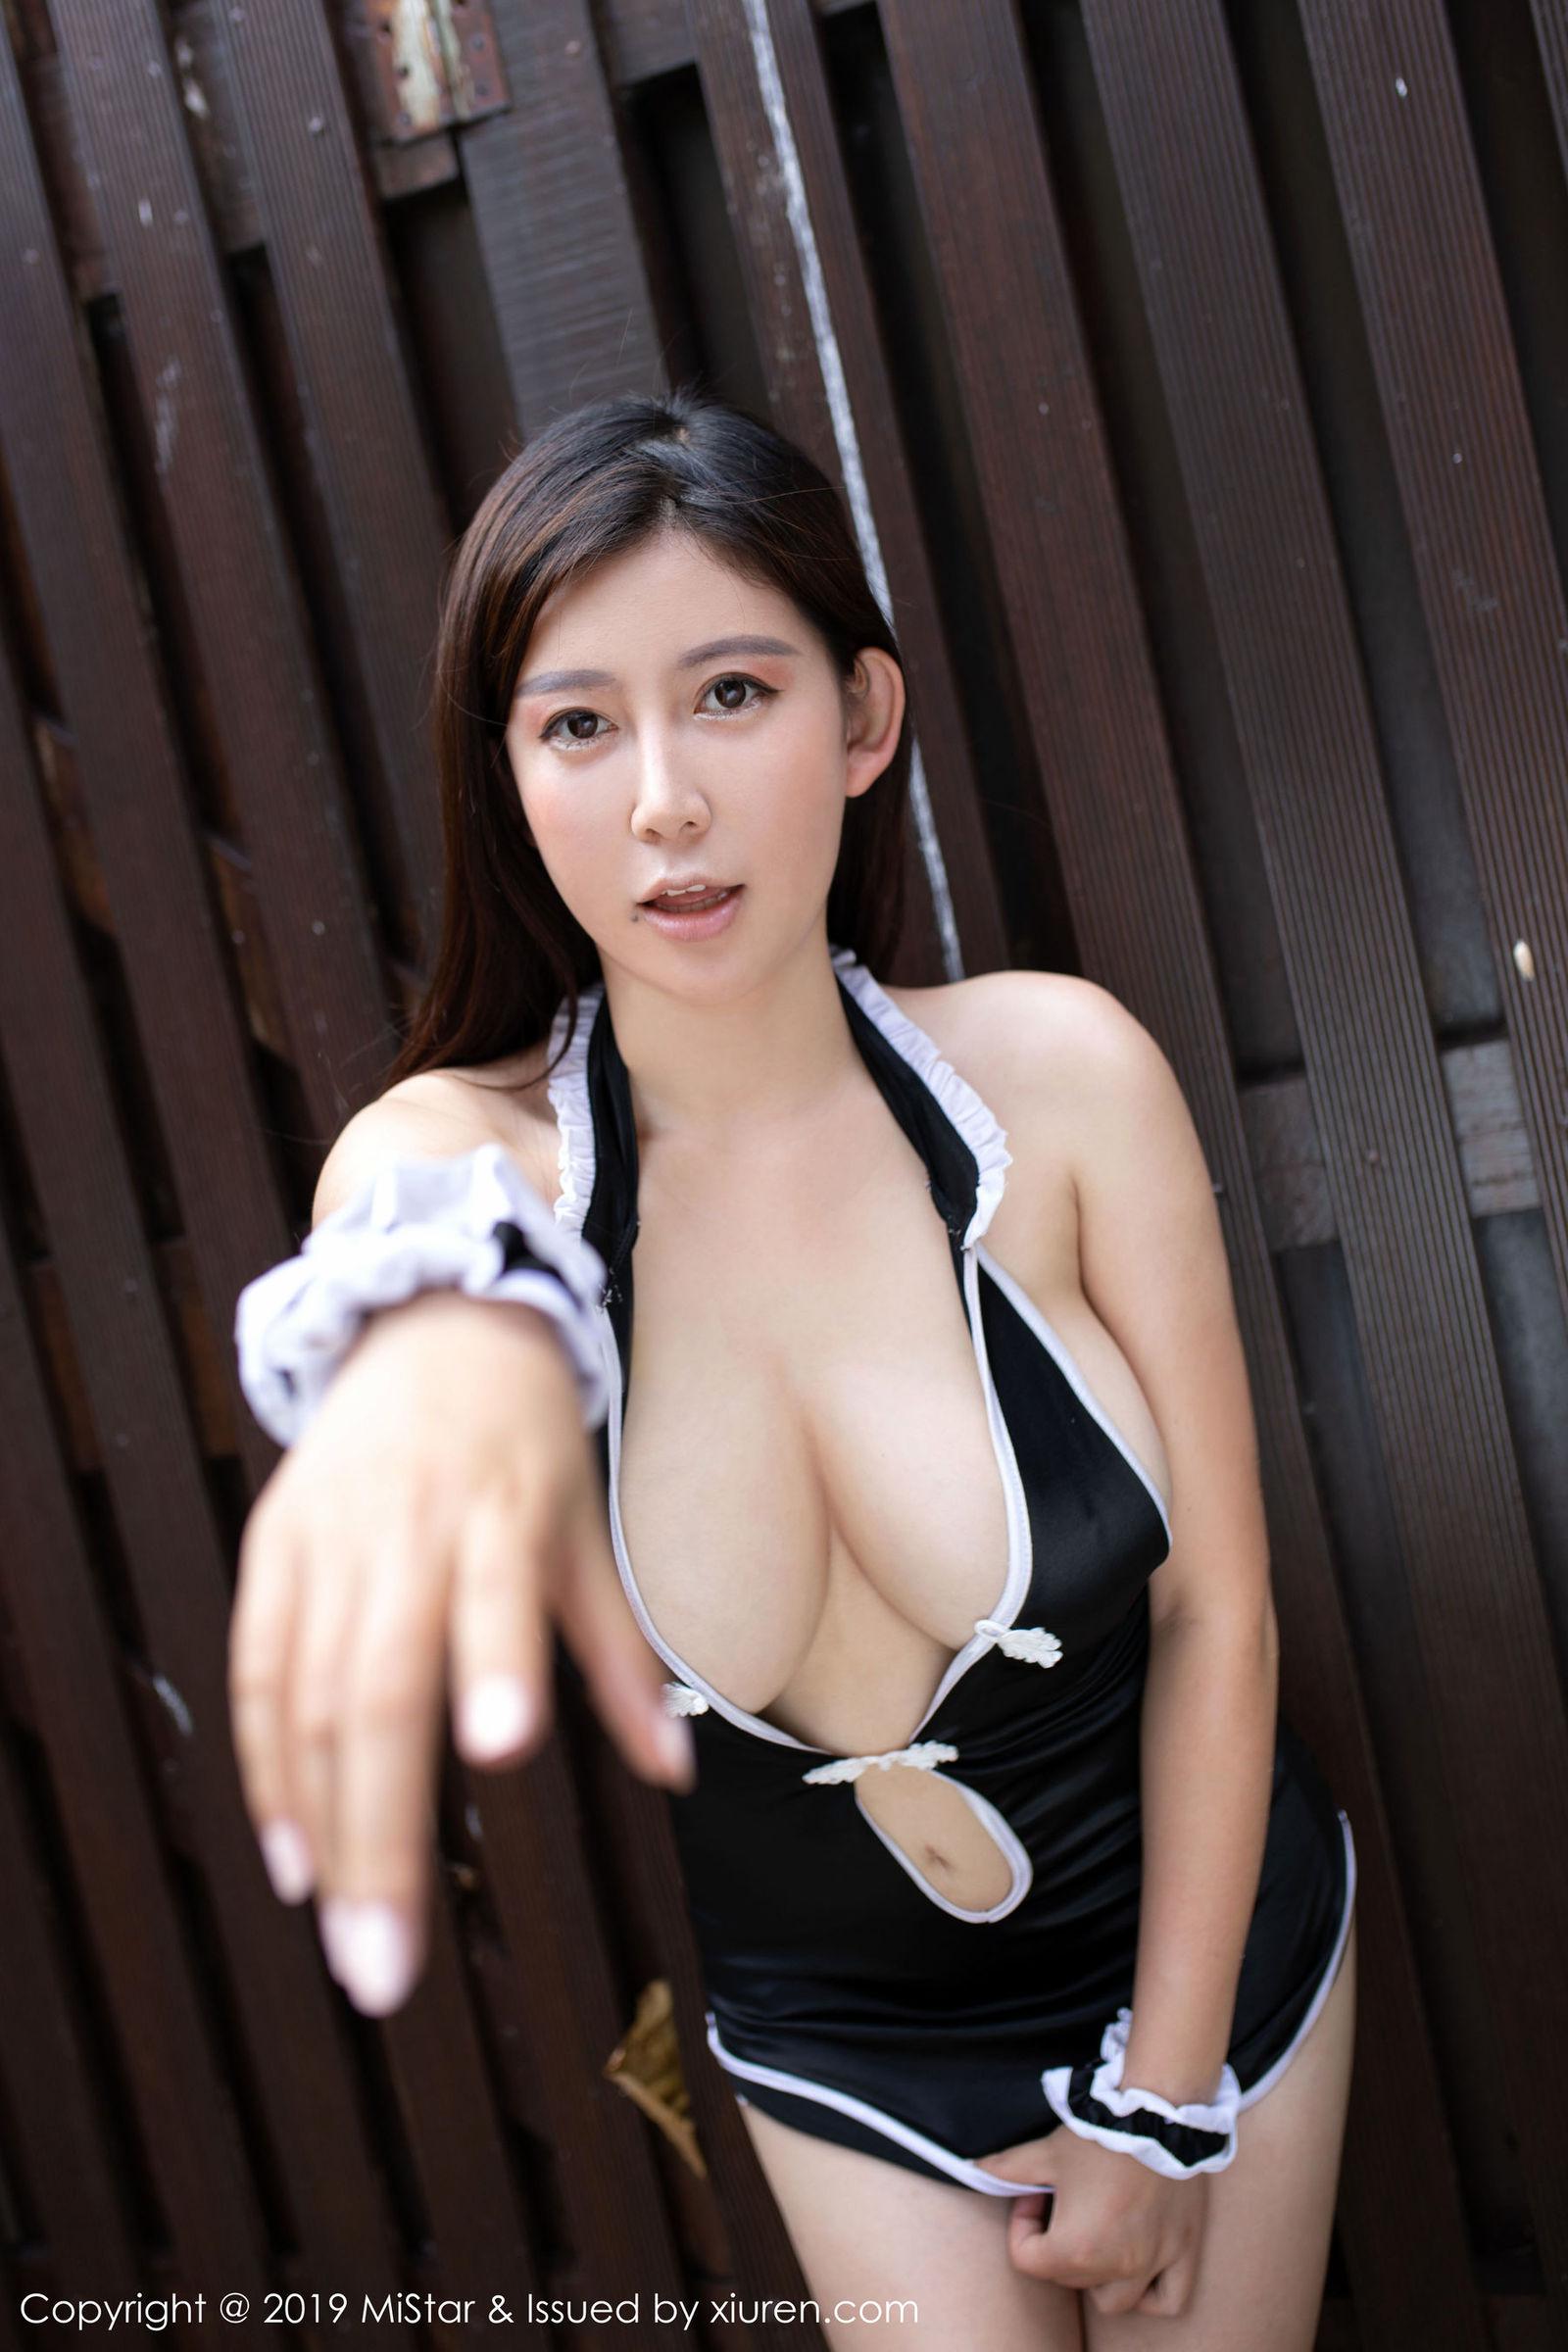 [MiStar魅妍社] VOL.305 模特@Abby李雅 - 仙本那旅拍[42P]